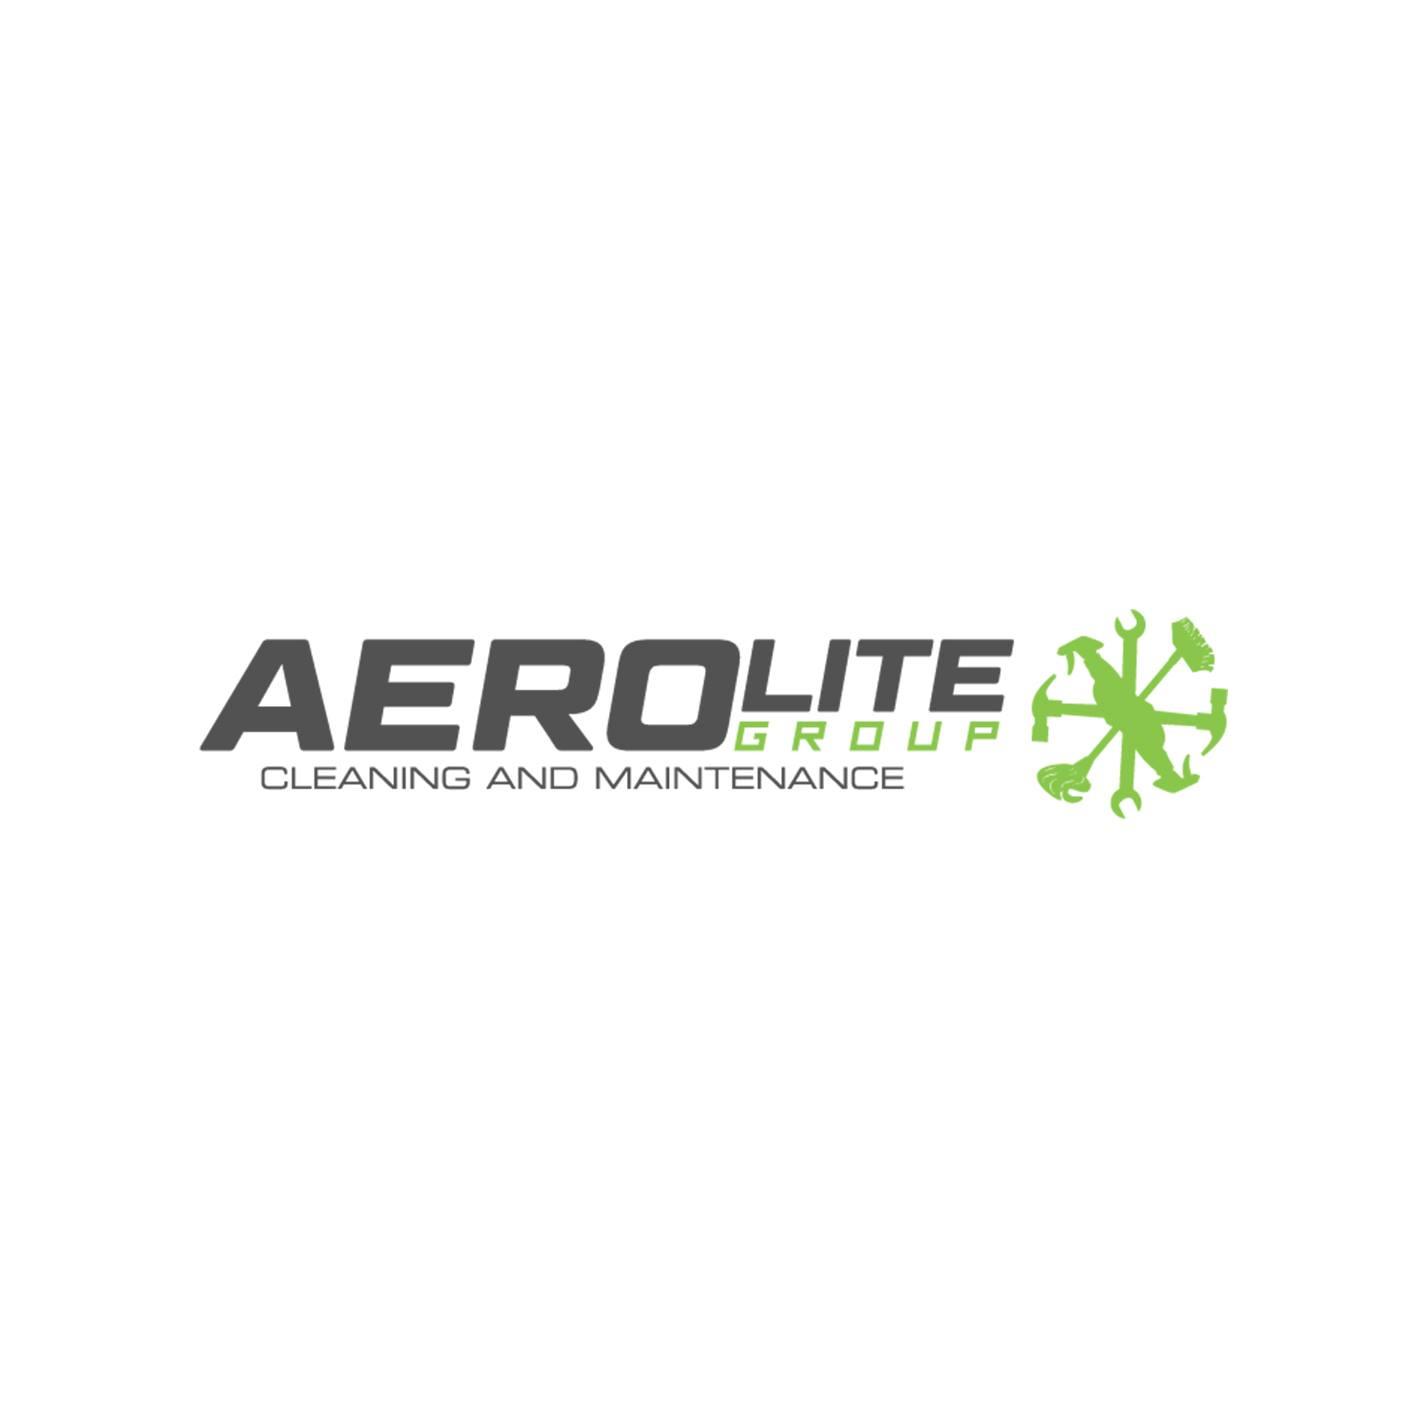 Aerolite Group